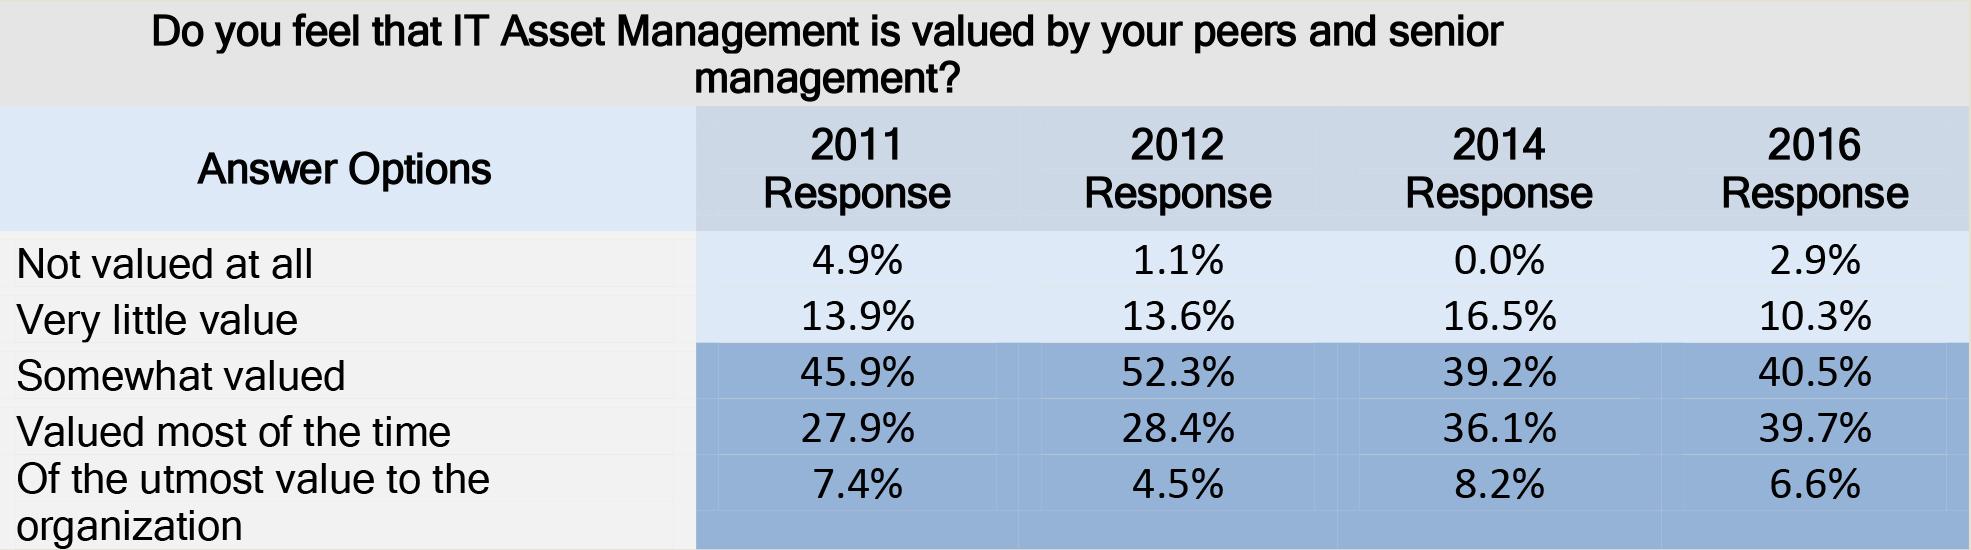 Perception of ITAM value results